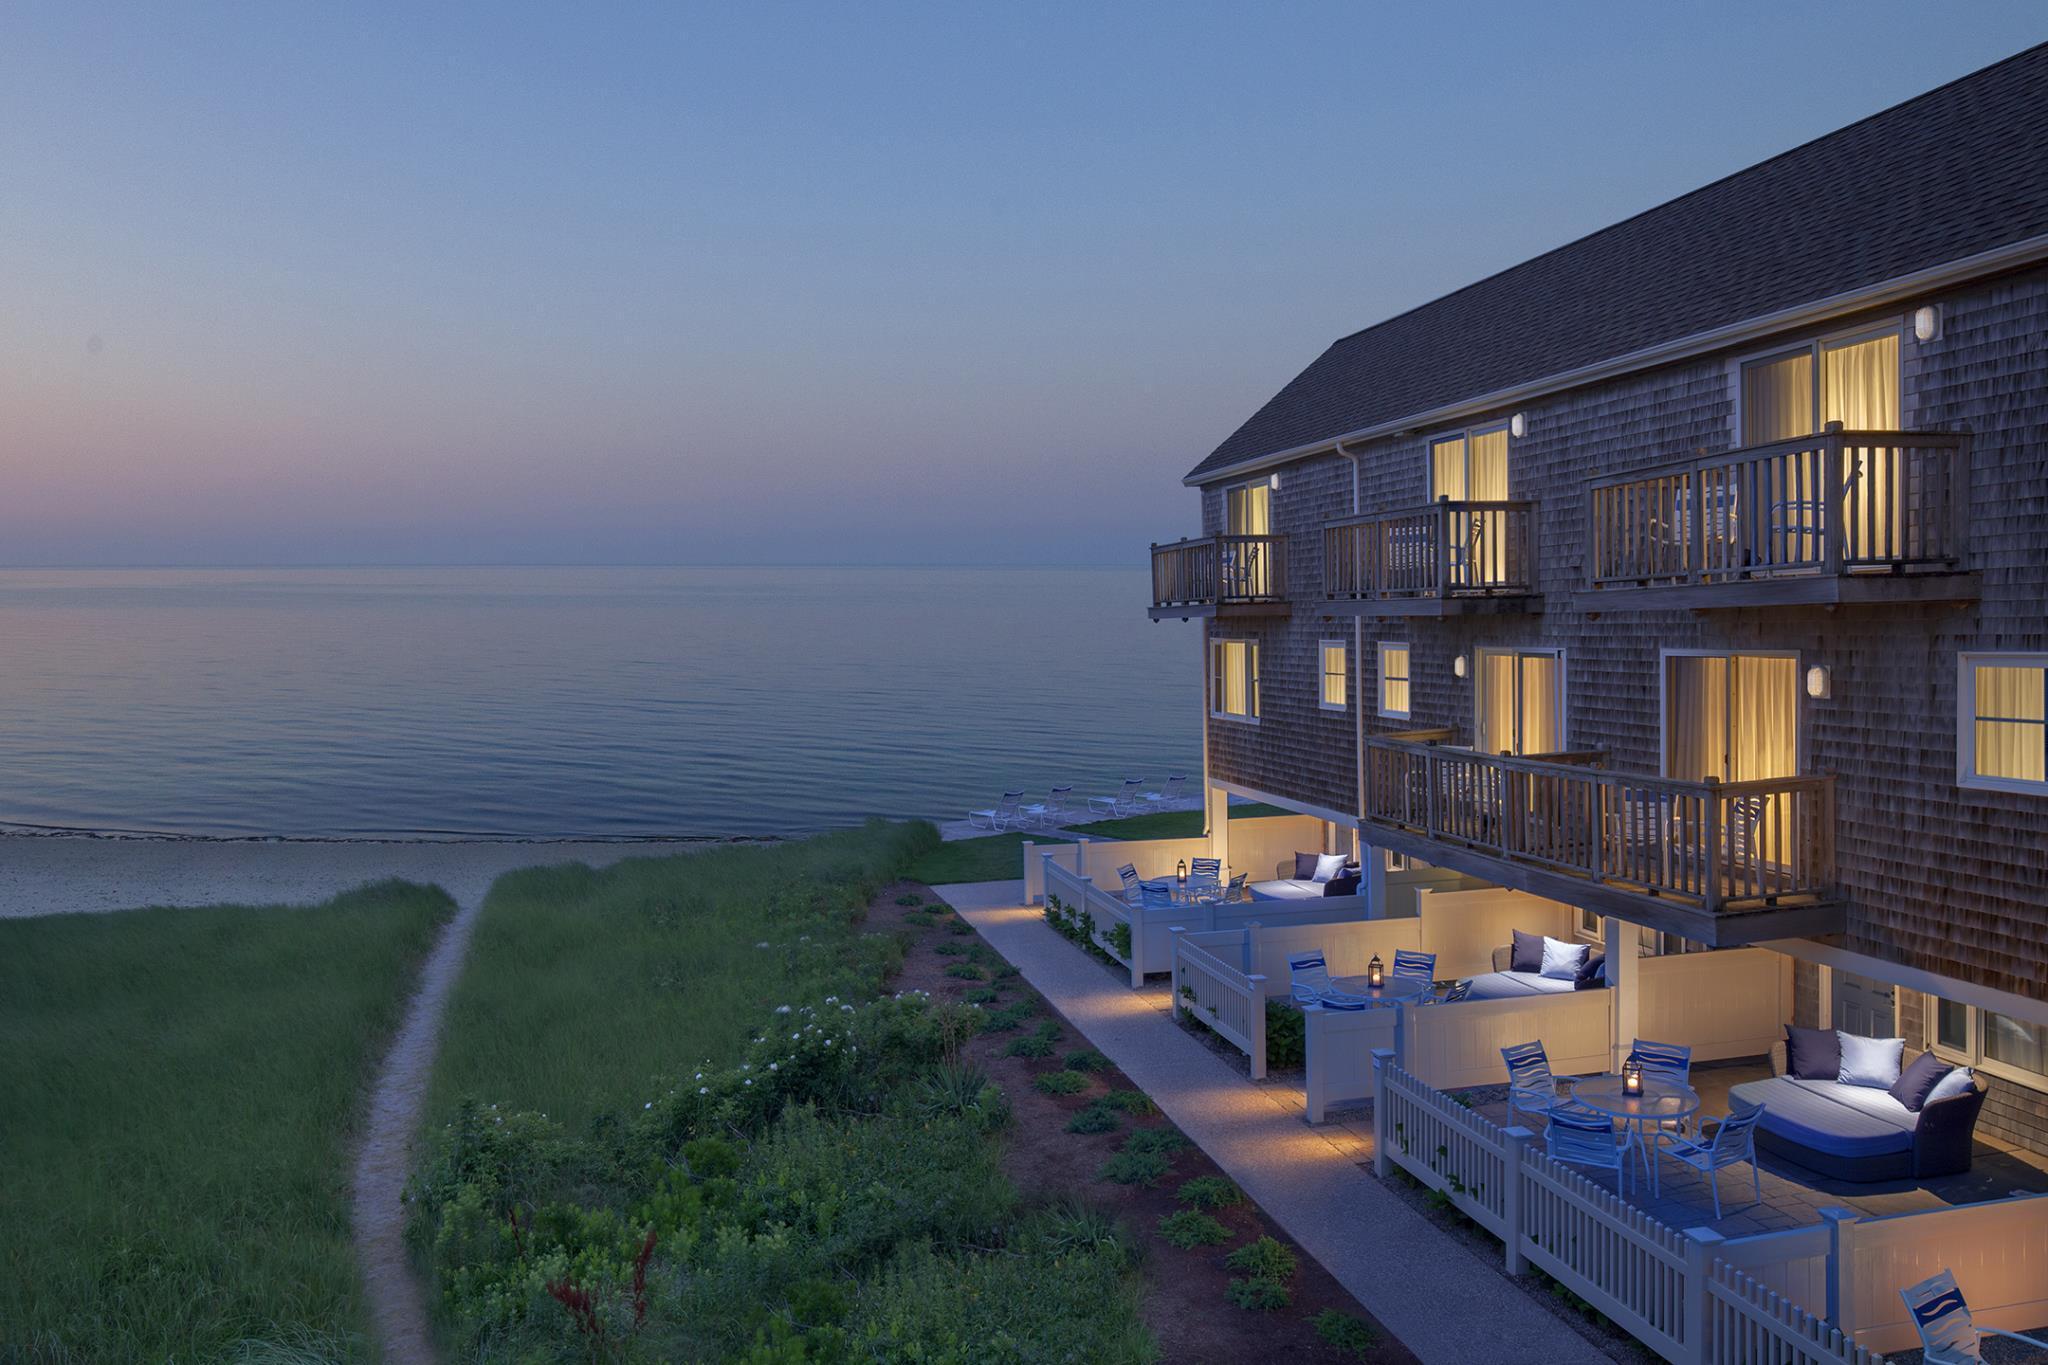 Ocean Mist Beach Hotel And Suites